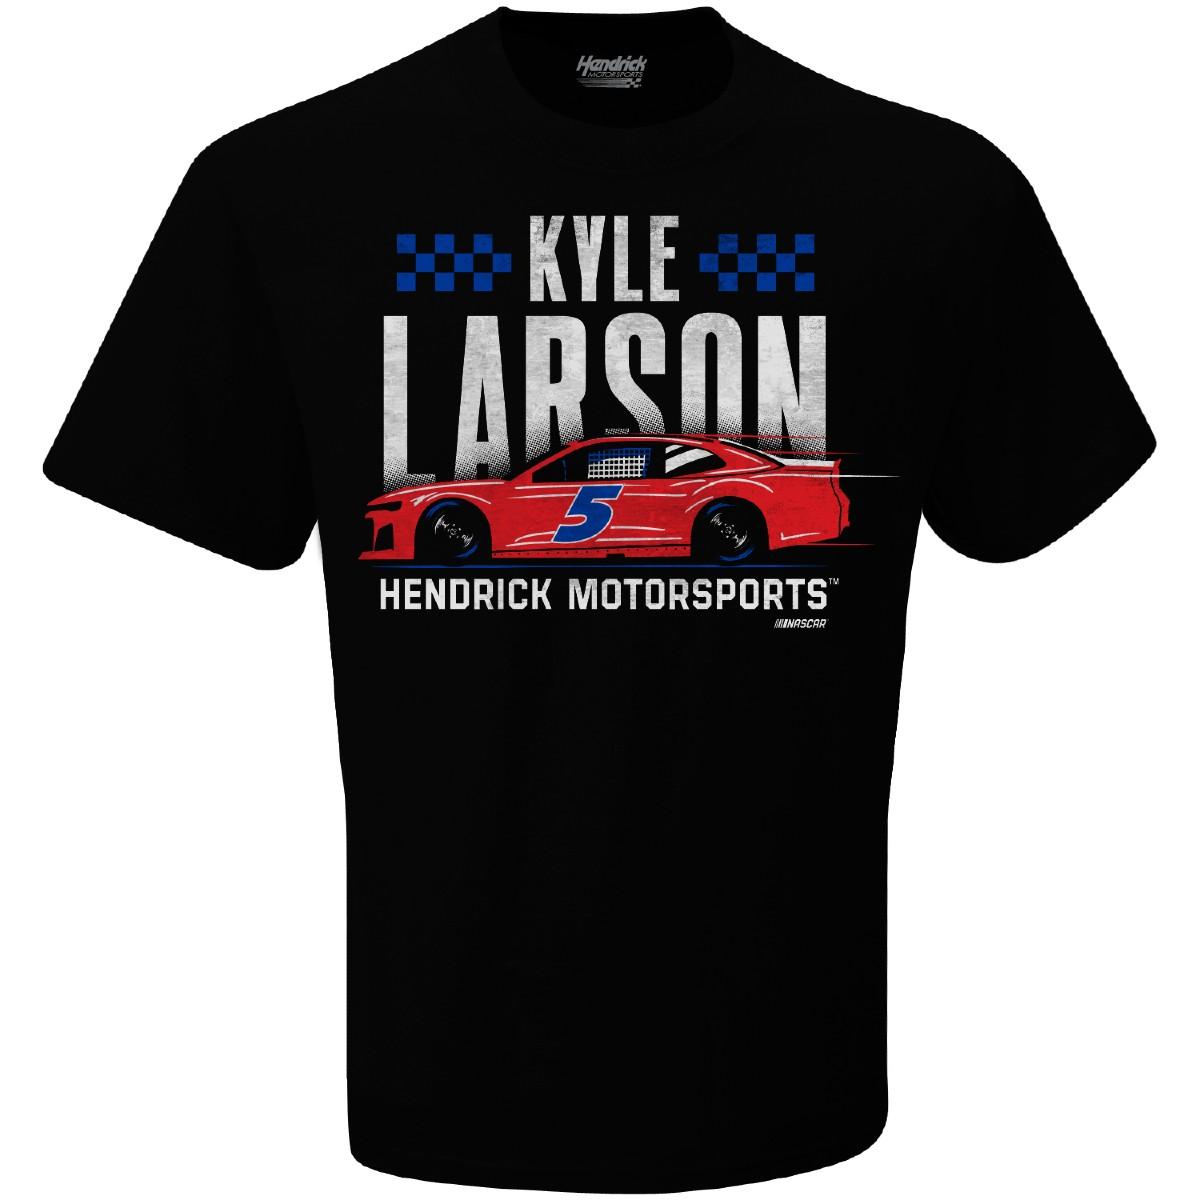 Kyle Larson 2021 #5 Black Graphic Tee